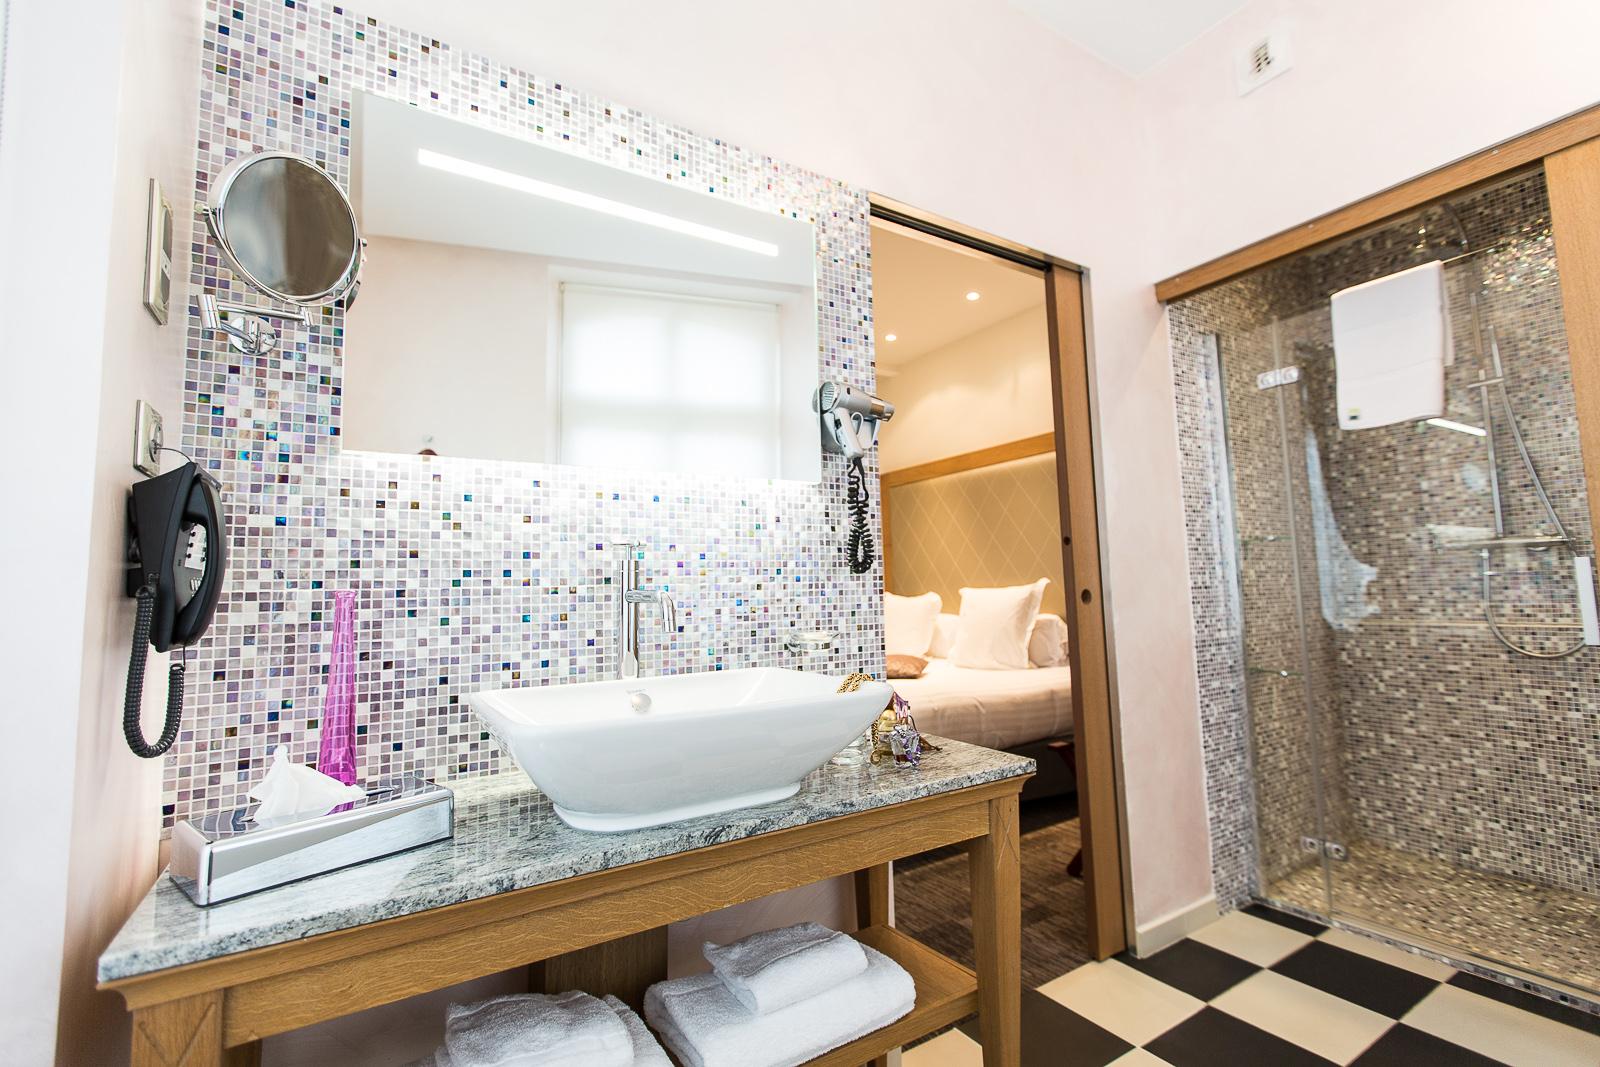 Hôtel Marotte chambre cosy seche cheveux